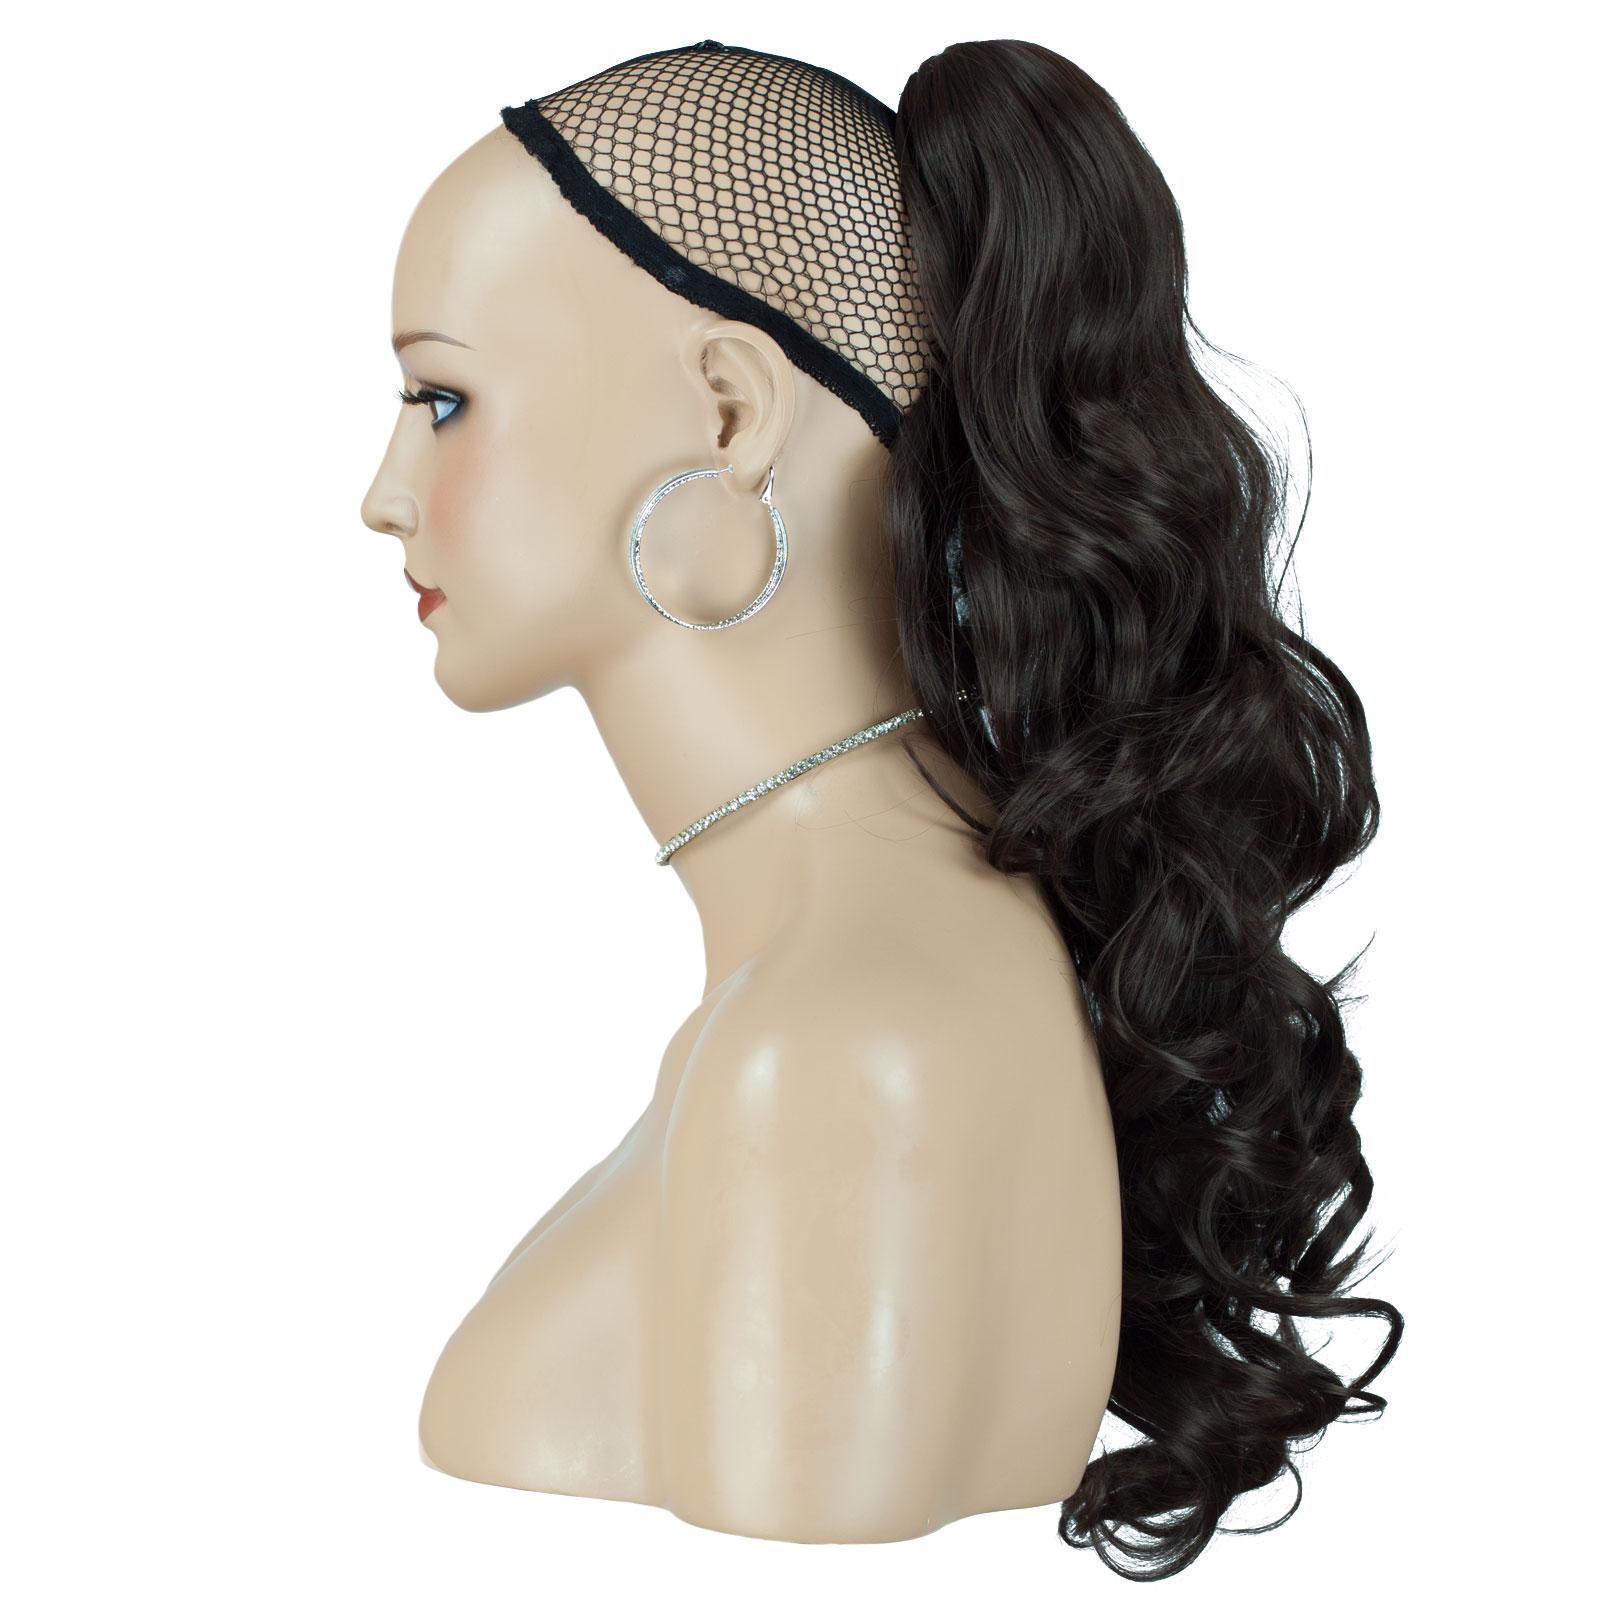 PONYTAIL Clip In Hair Extensions Medium Brown #6 REVERSIBLE 4 Styles ...